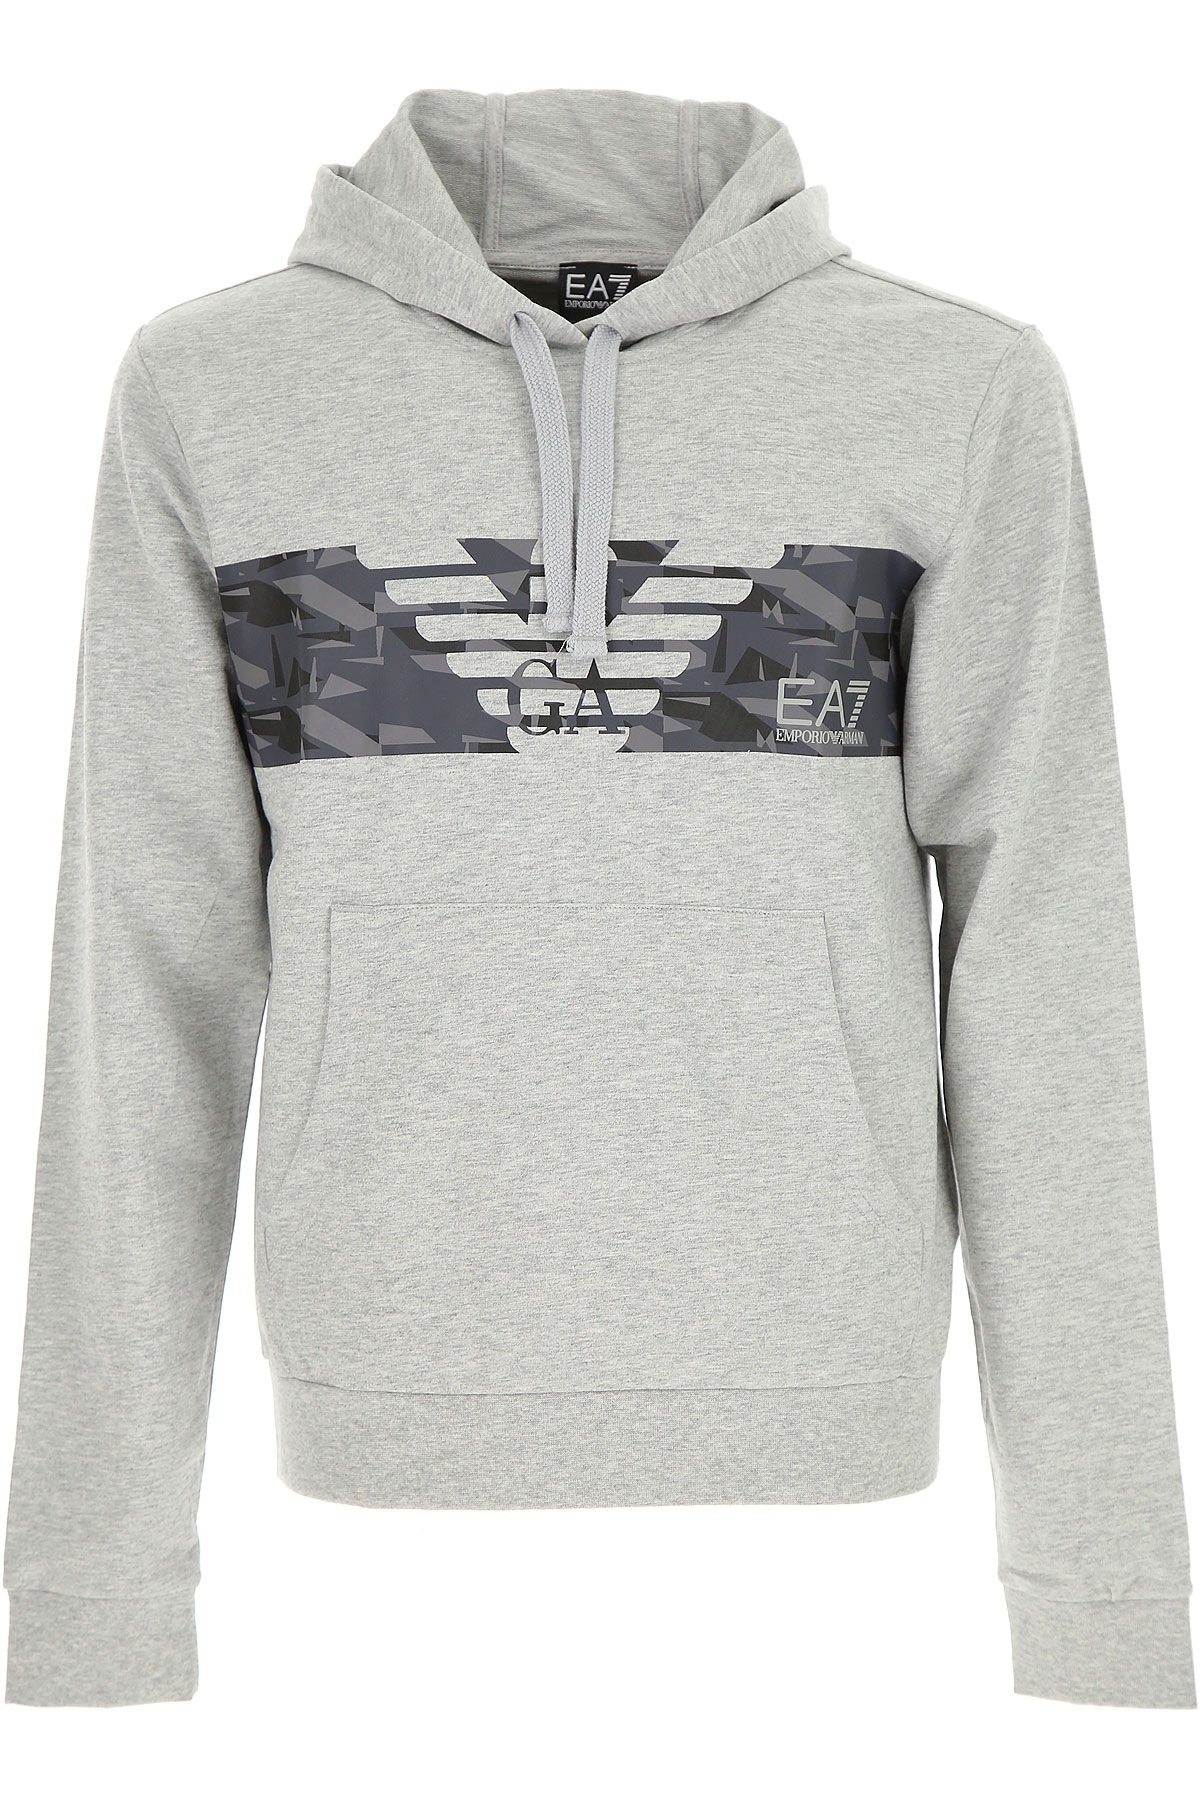 Emporio Armani Sweatshirt for Men, Light Grey Melange, Cotton, 2017, L M XL XXL USA-449478